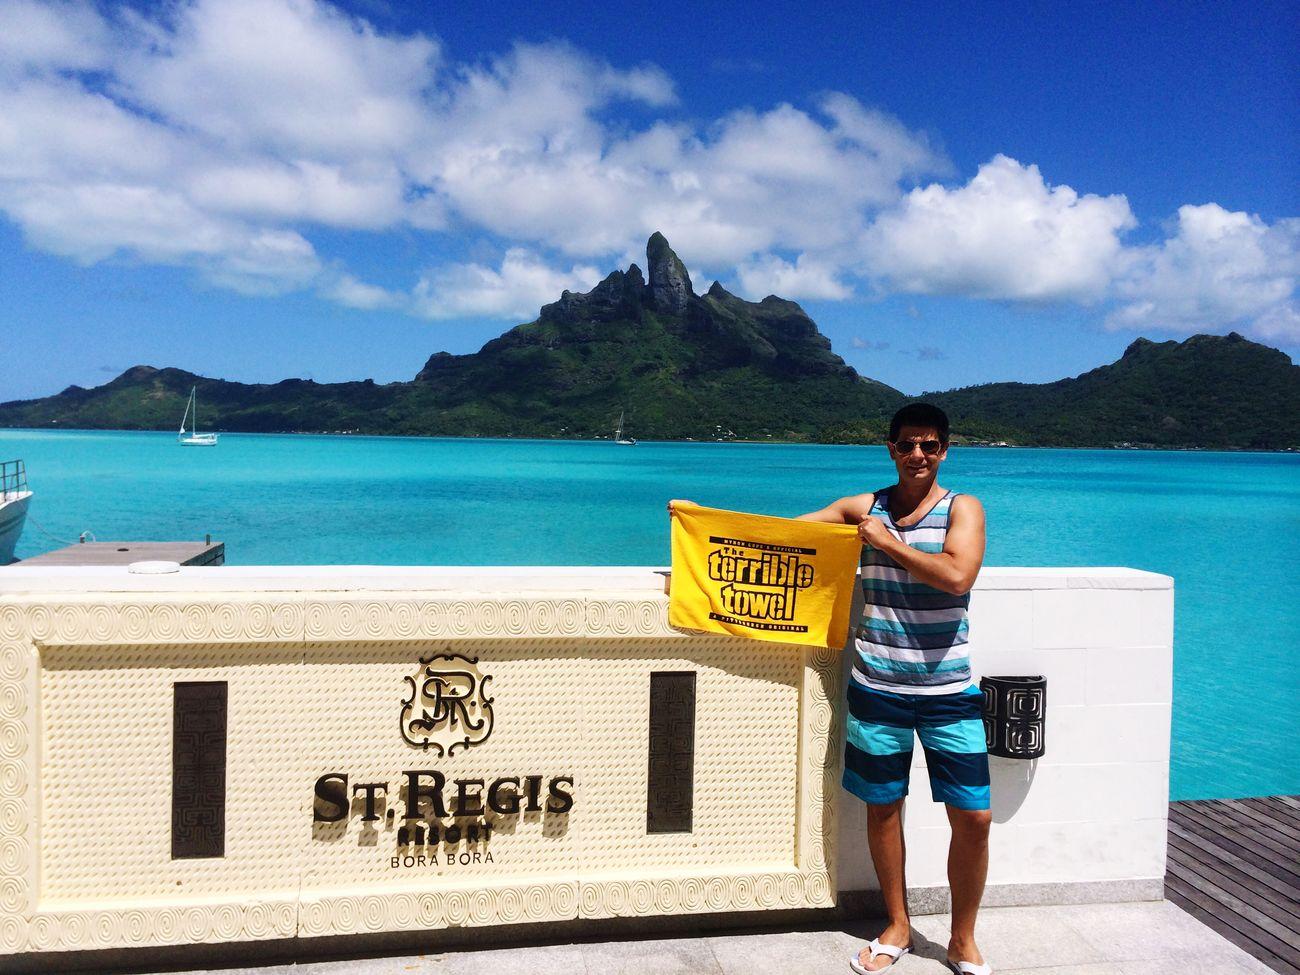 Steelers Pride  Bora Bora  View That's Me